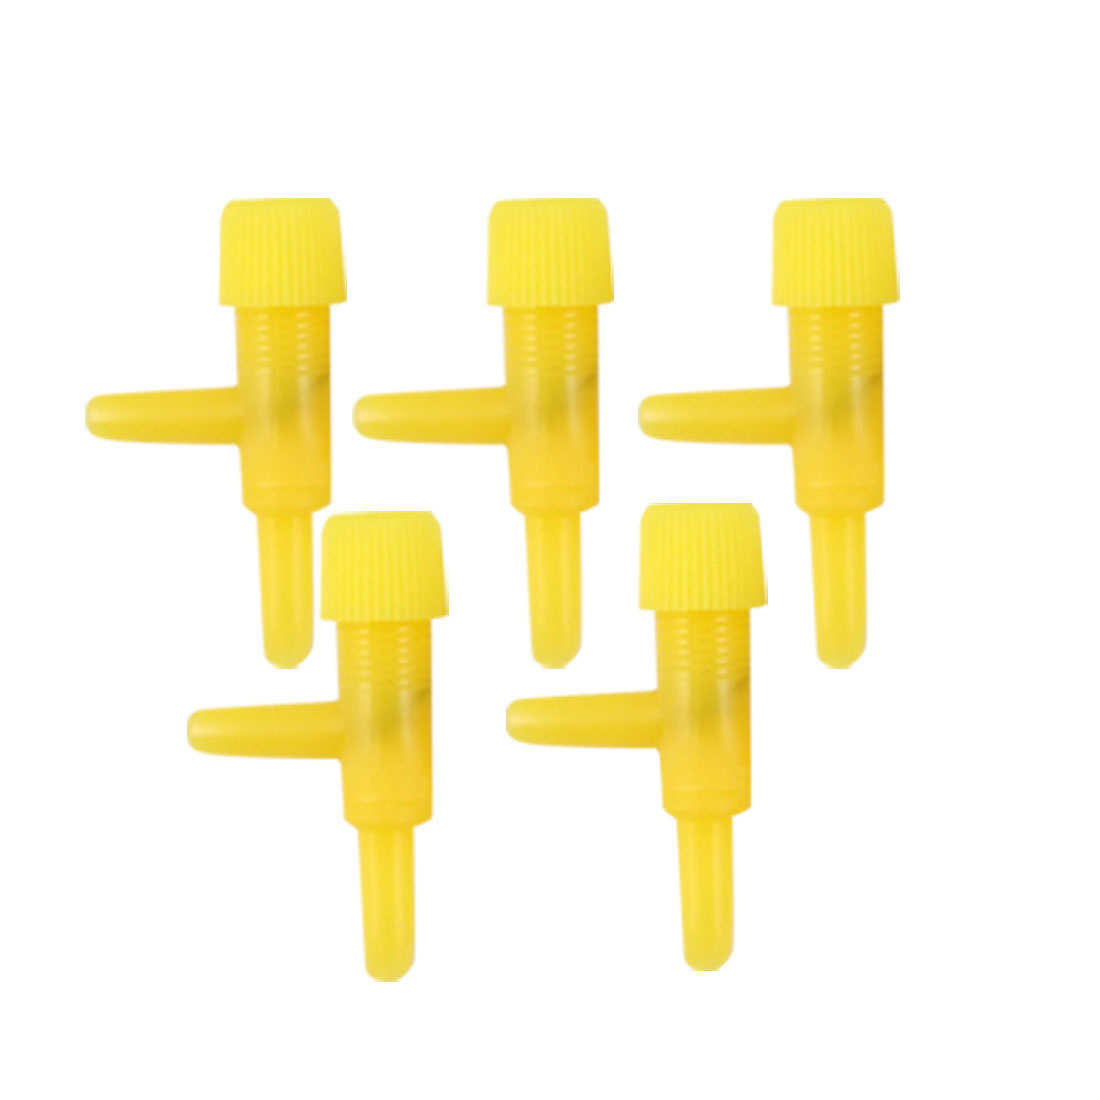 5 Pcs 2 Way Yellow Plastic Air Control Valve for Aquarium